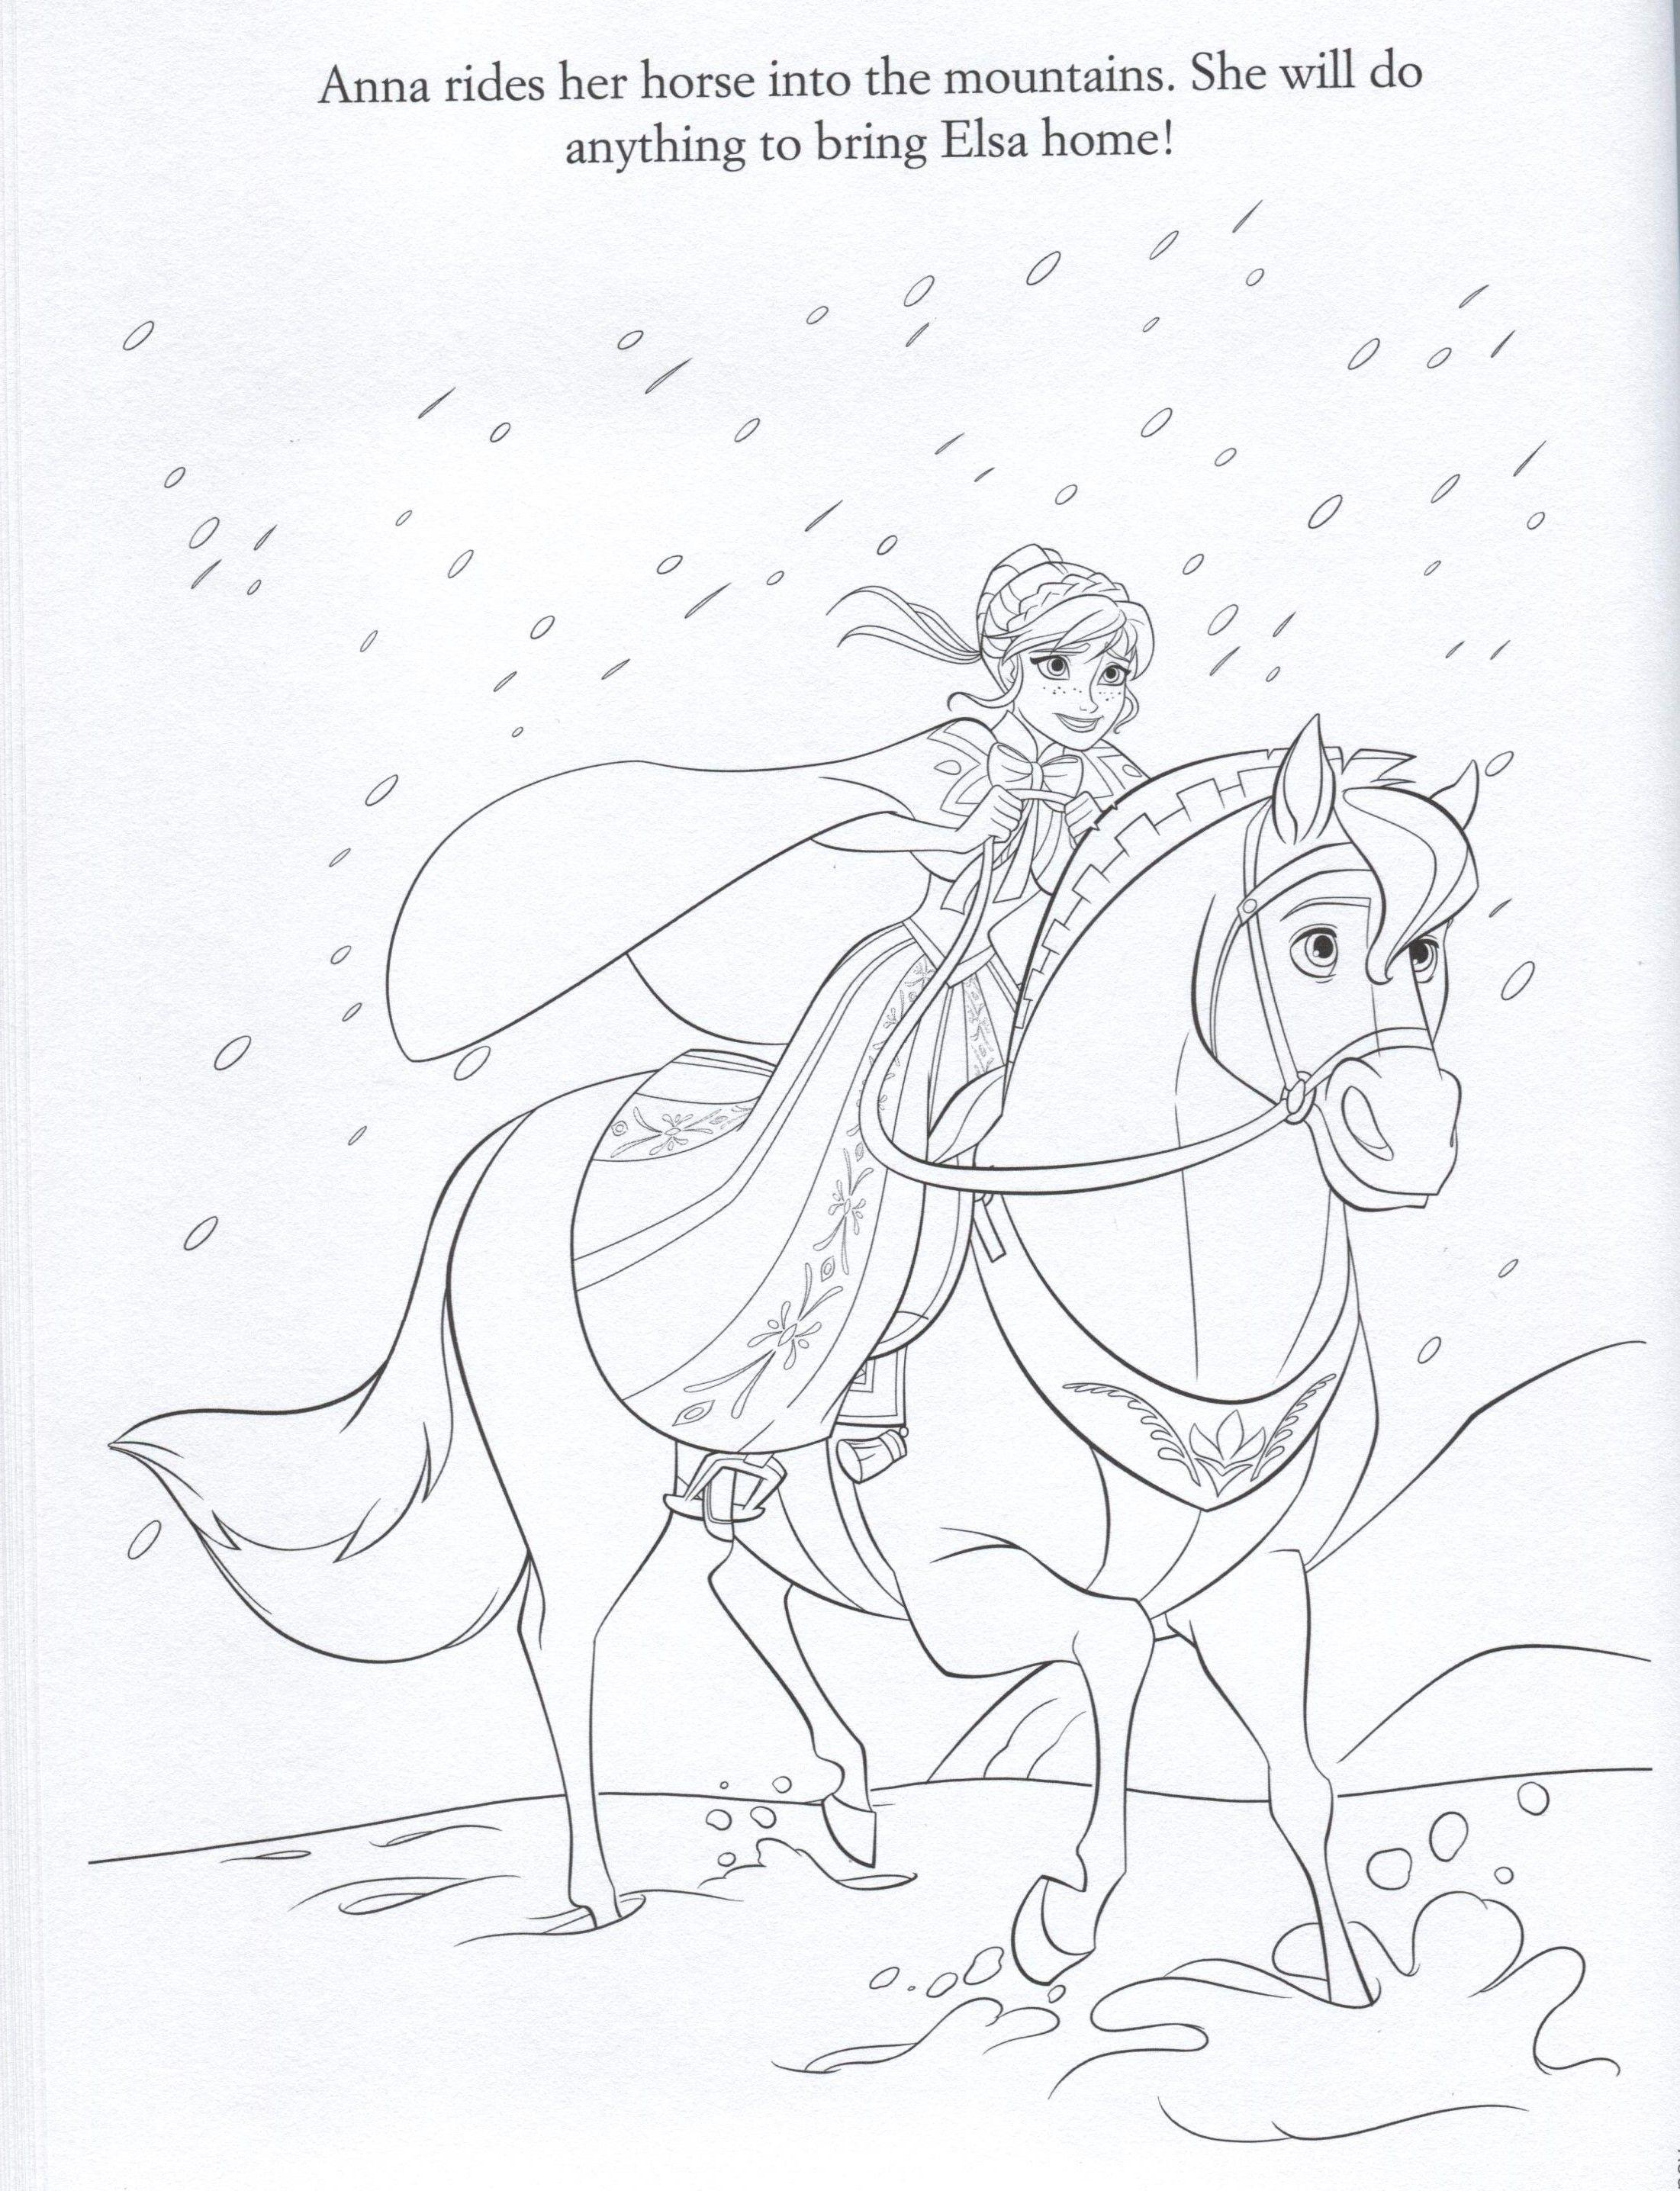 Frozen Photo Official Frozen Illustrations Coloring Pages Frozen Coloring Pages Horse Coloring Pages Disney Coloring Pages